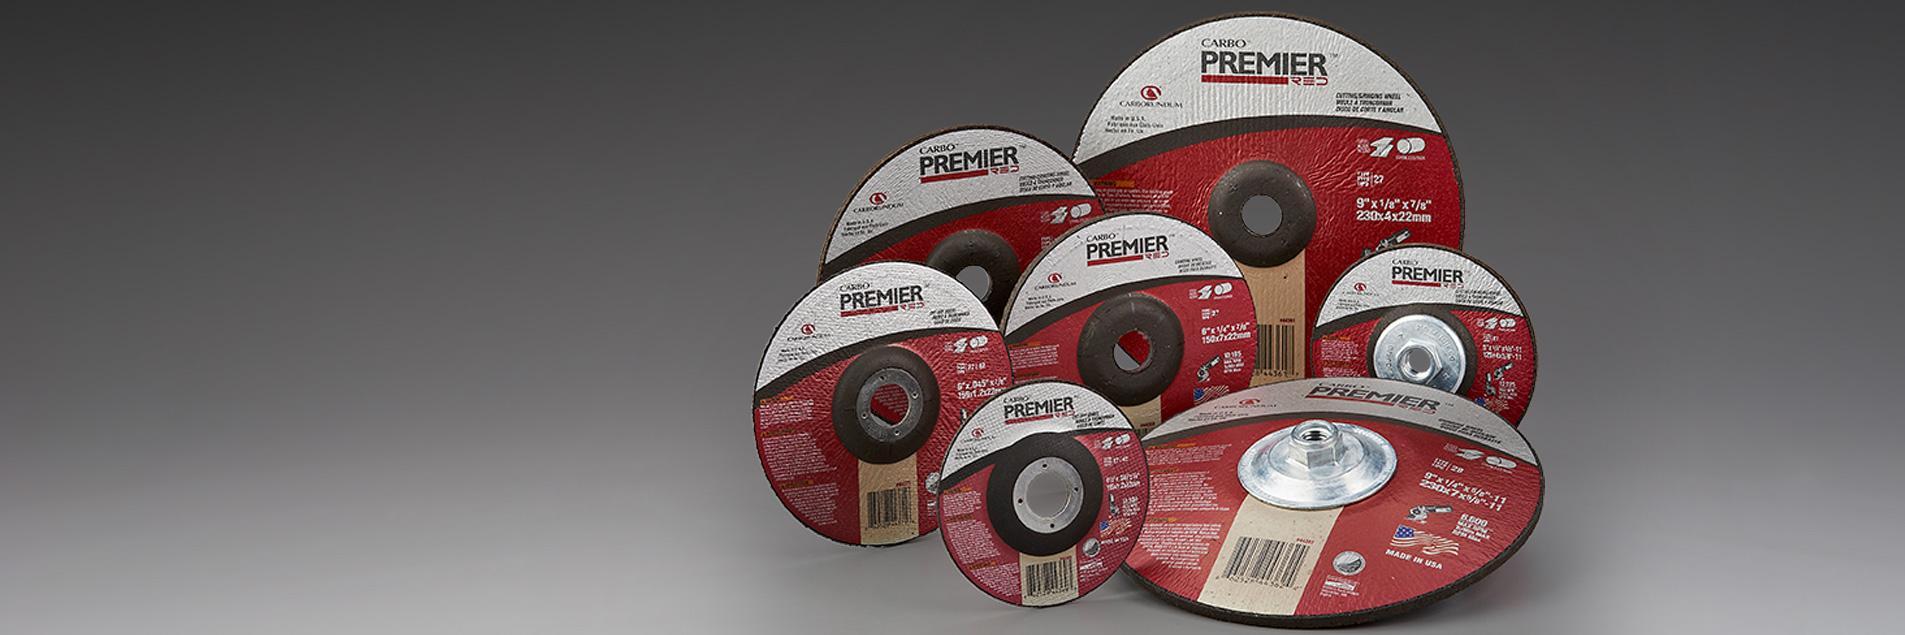 Carbo Premier Red Depressed Center Wheels